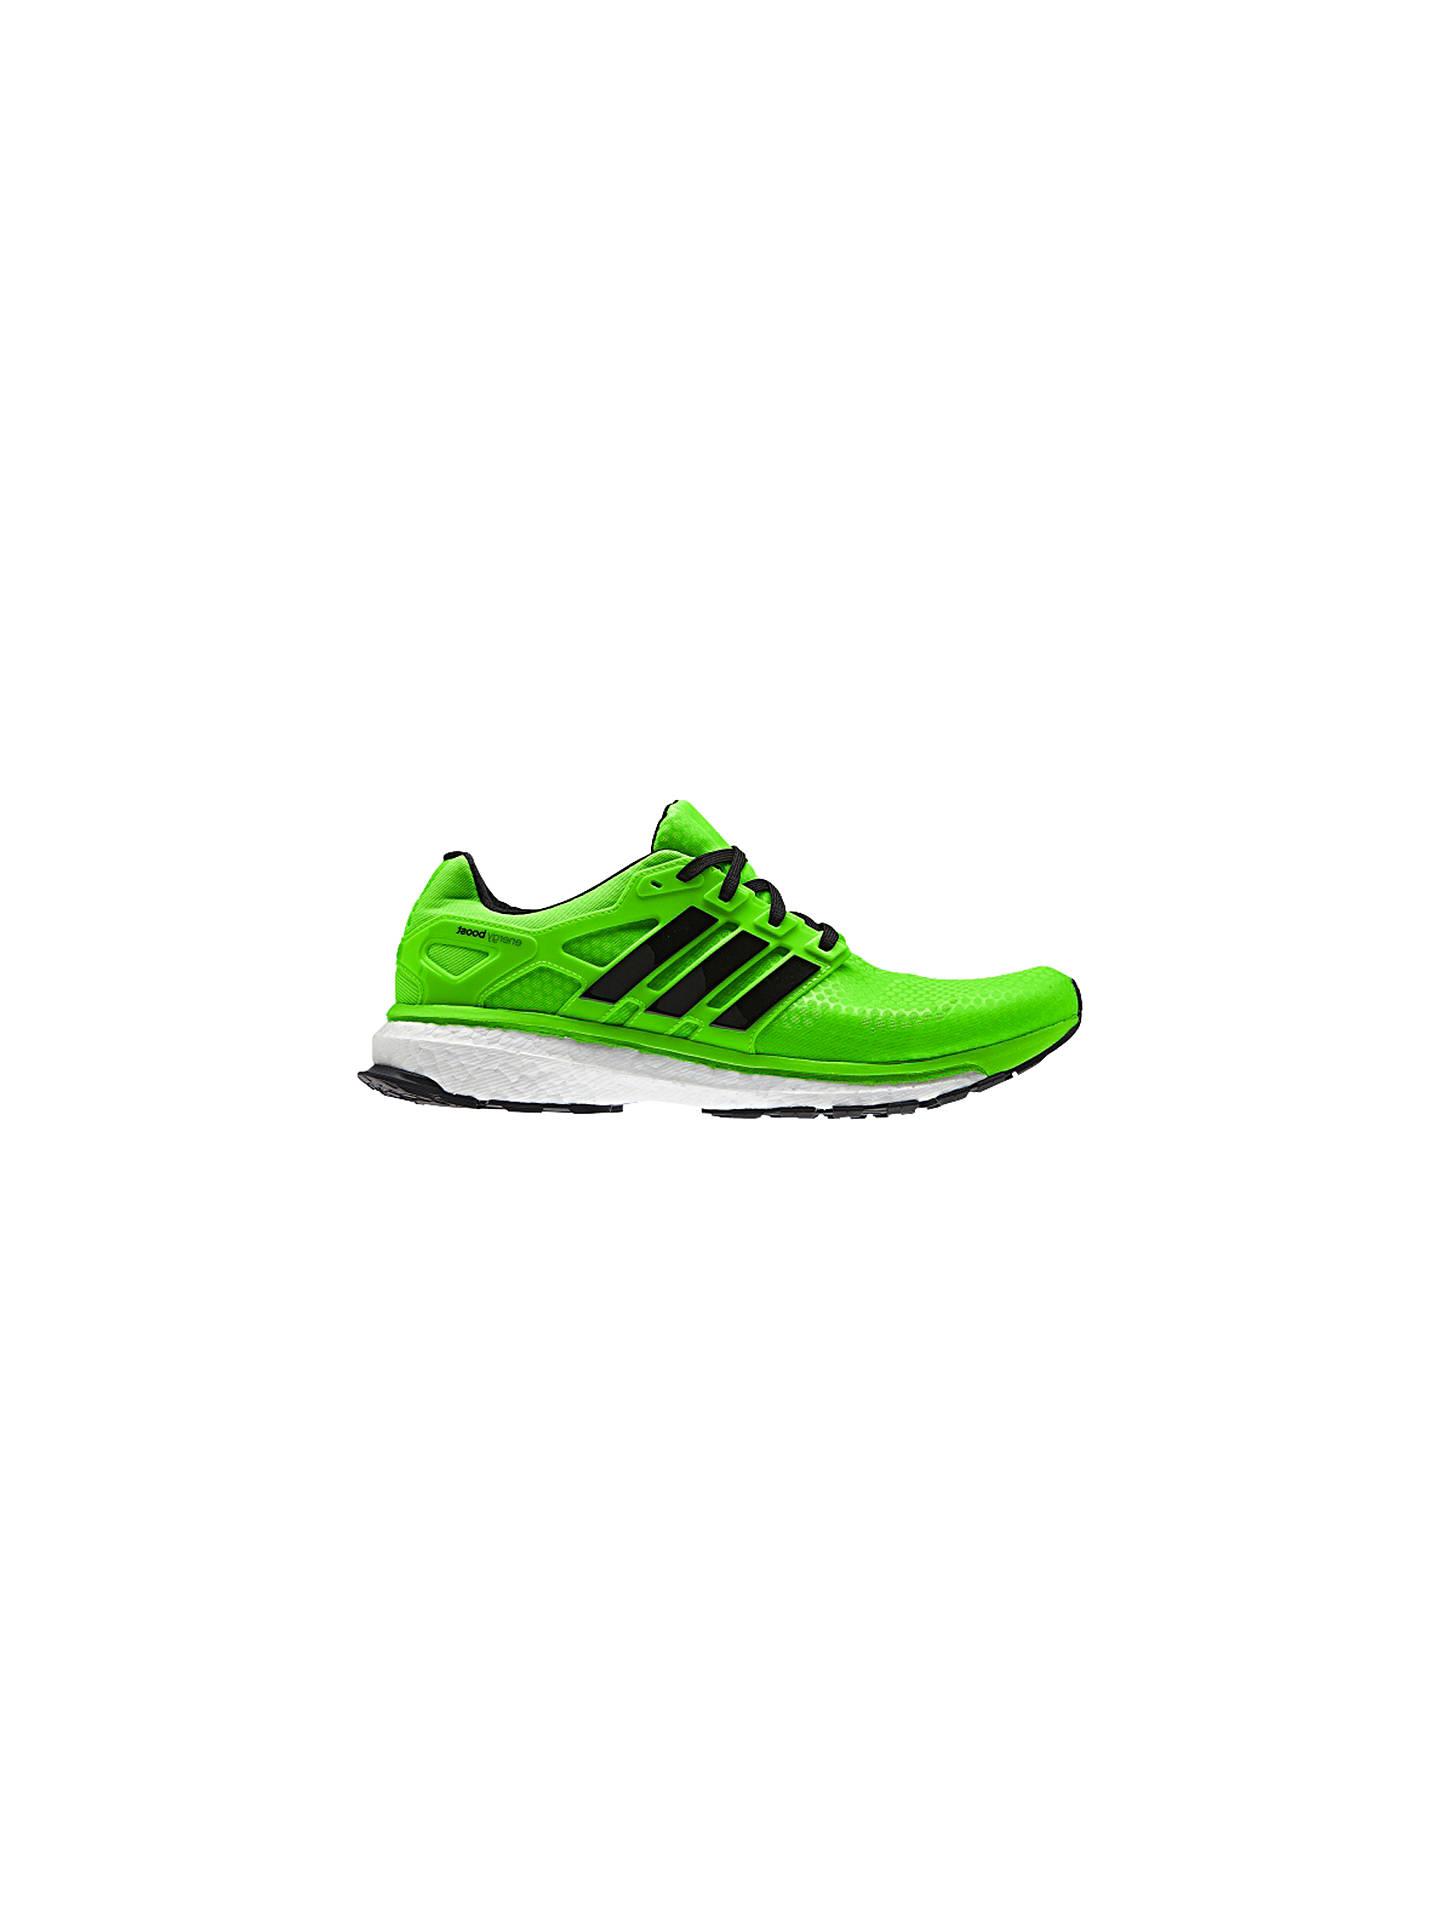 3738b776b3bf2 Buy Adidas Energy Boost 2.0 ATR Men s Running Shoes